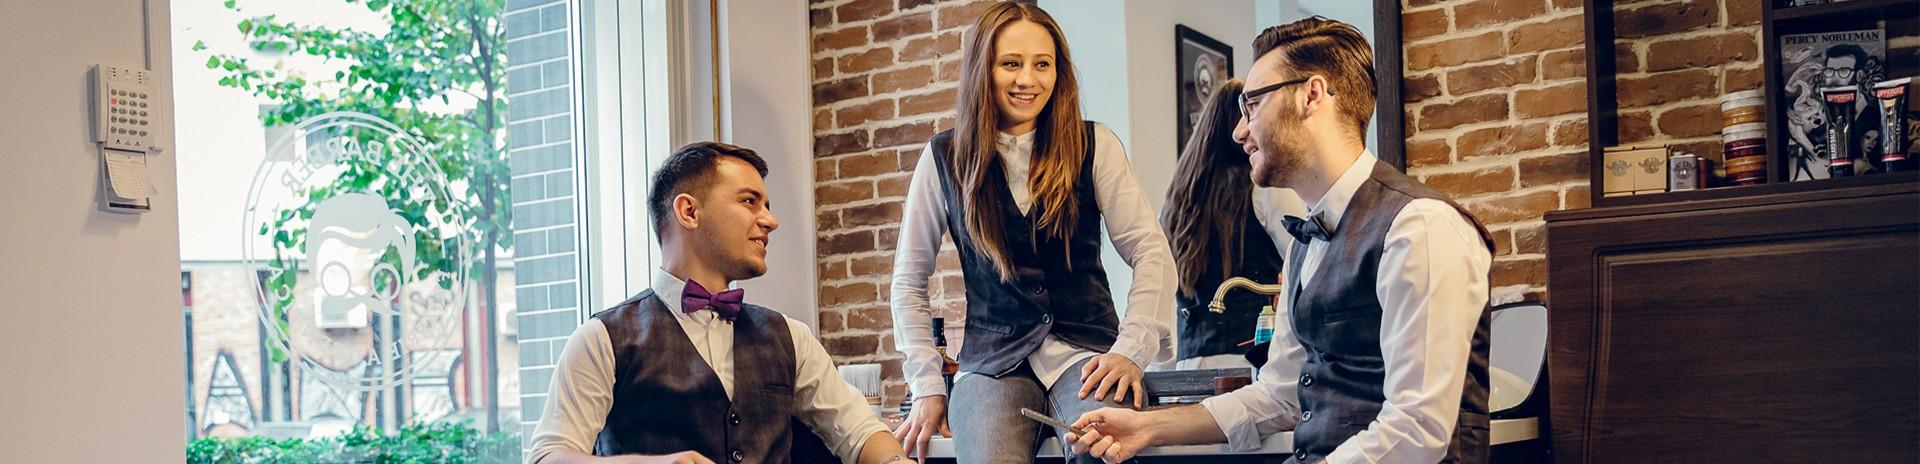 frizerie-titulescu-bucuresti-barber-shop-tuns-barba-the-barber-03